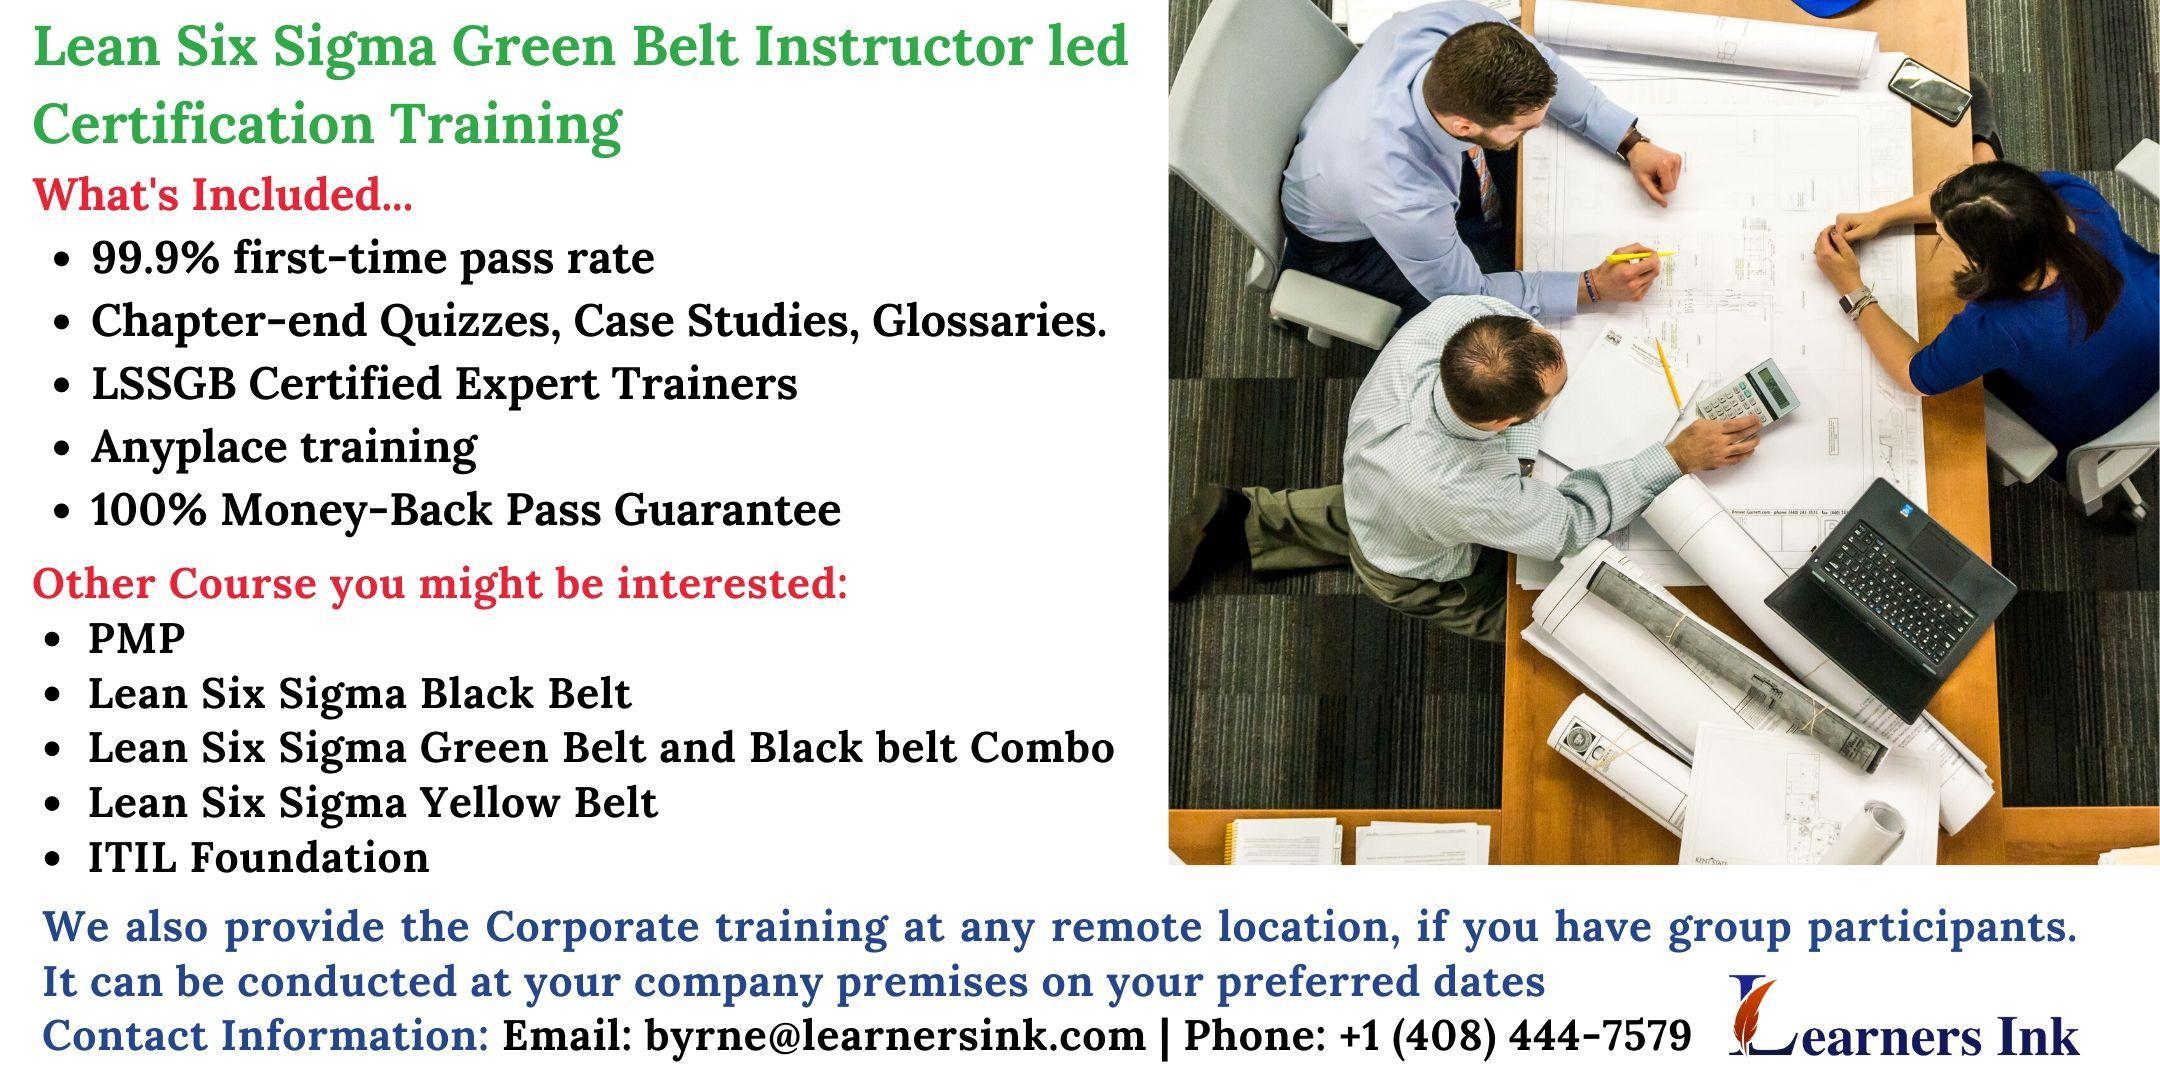 Lean Six Sigma Green Belt Certification Training Course (LSSGB) in Burbank